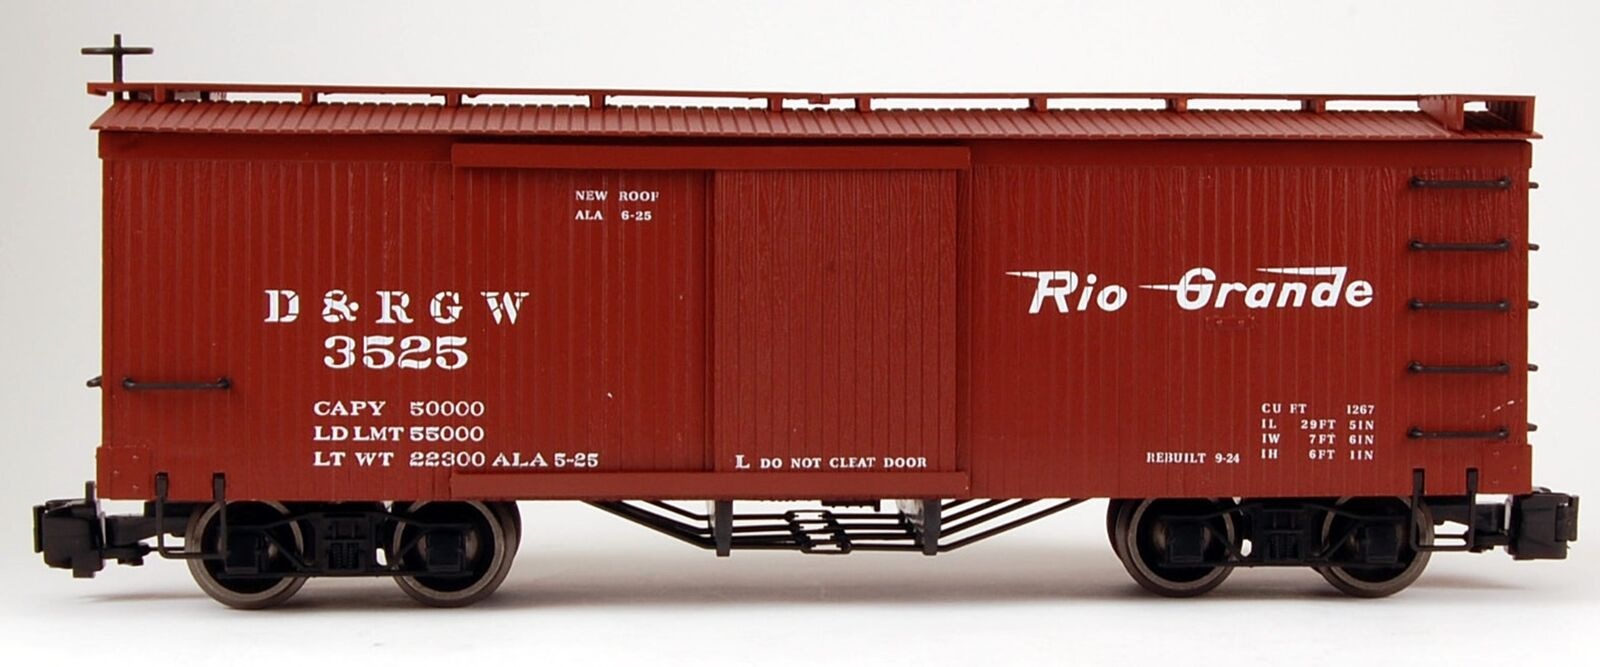 Bachmann G Scale (1 22.5) Train Box Car D D D & RGW 93301 7cd7de